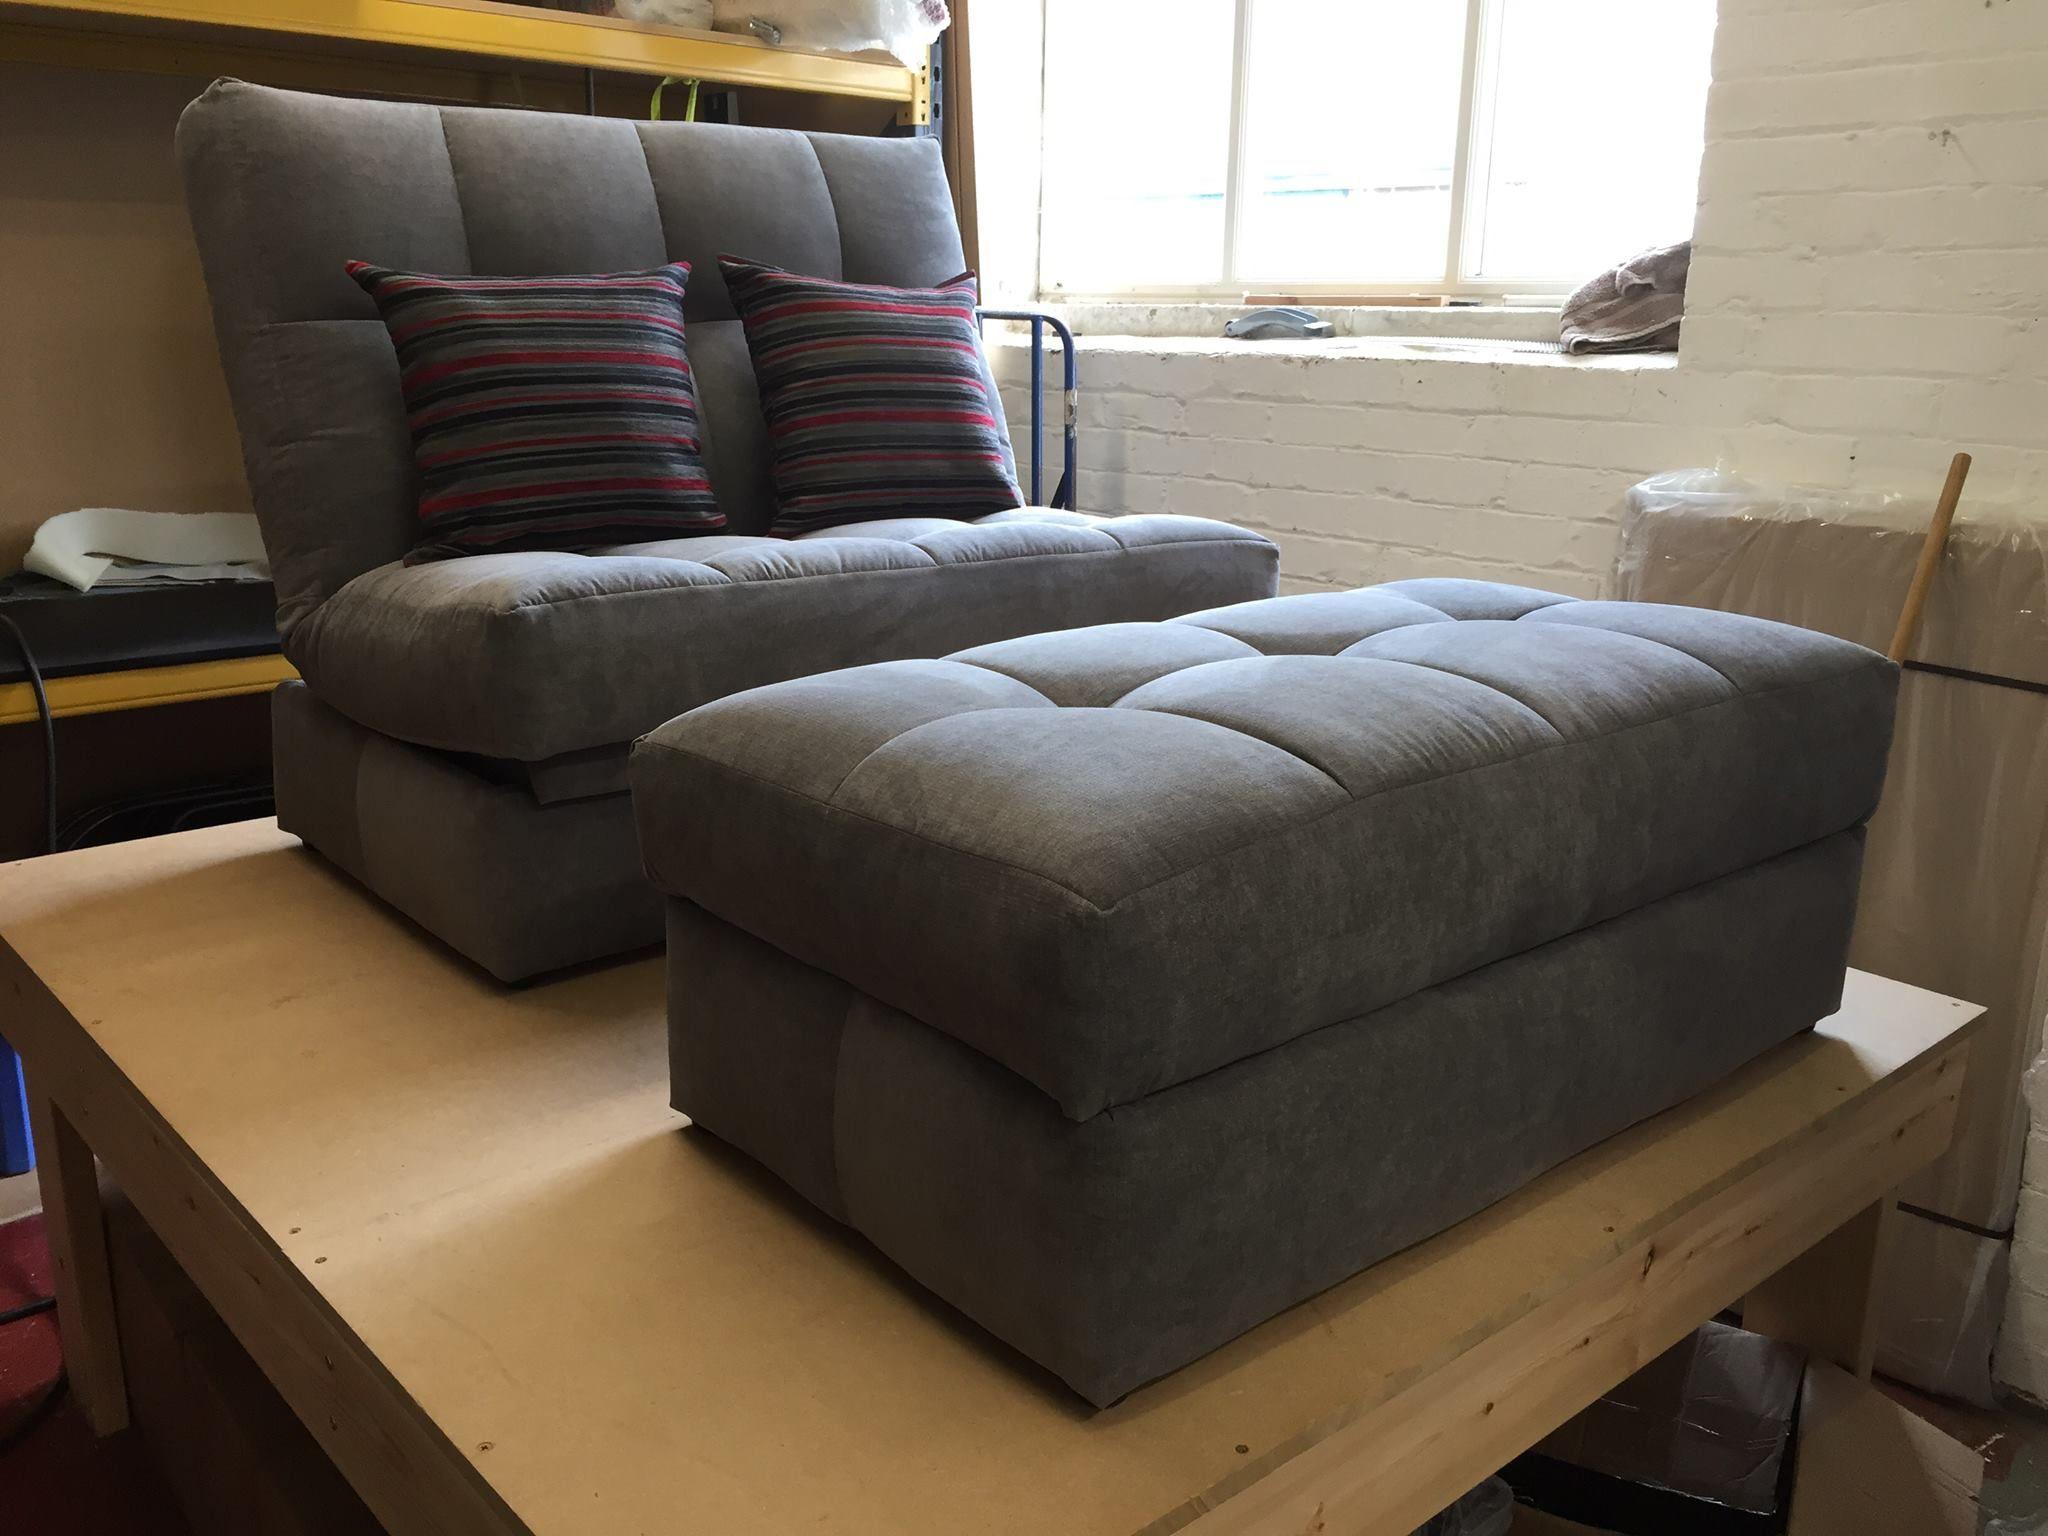 Dalton Sofa Bed Contemporary Furniture Plus Storage Box Designed And Made At